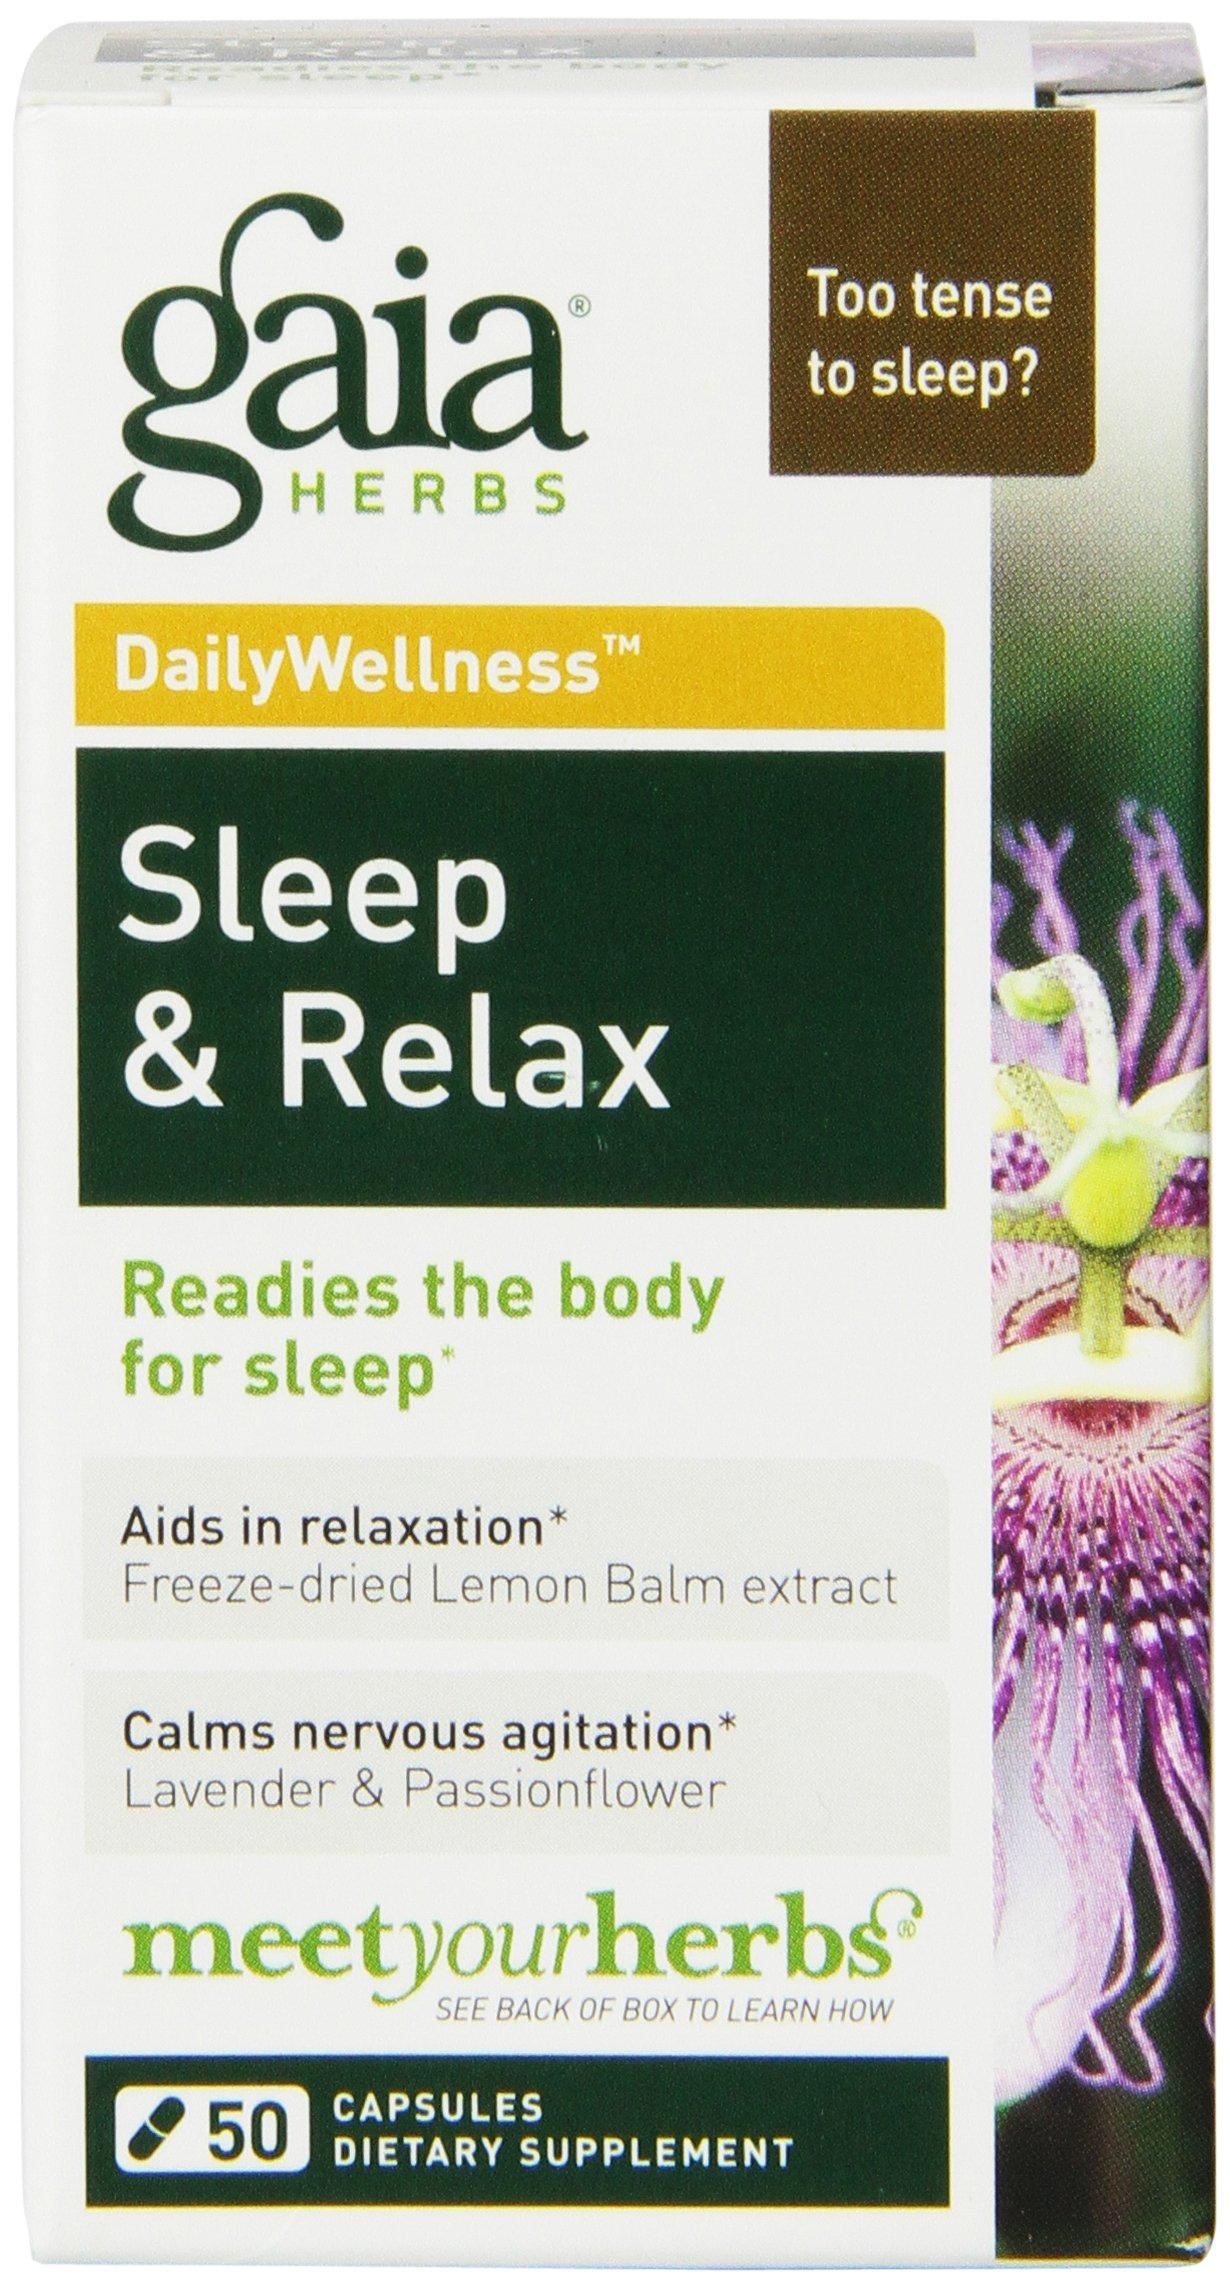 Gaia Herbs Sleep & Relax, 50 Vegan Capsules - Natural Sleep Aid, Calms the Mind & Promotes Deep Sleep, Non-Habit Forming, Valerian Root, Lemon Balm Extract, USDA Organic